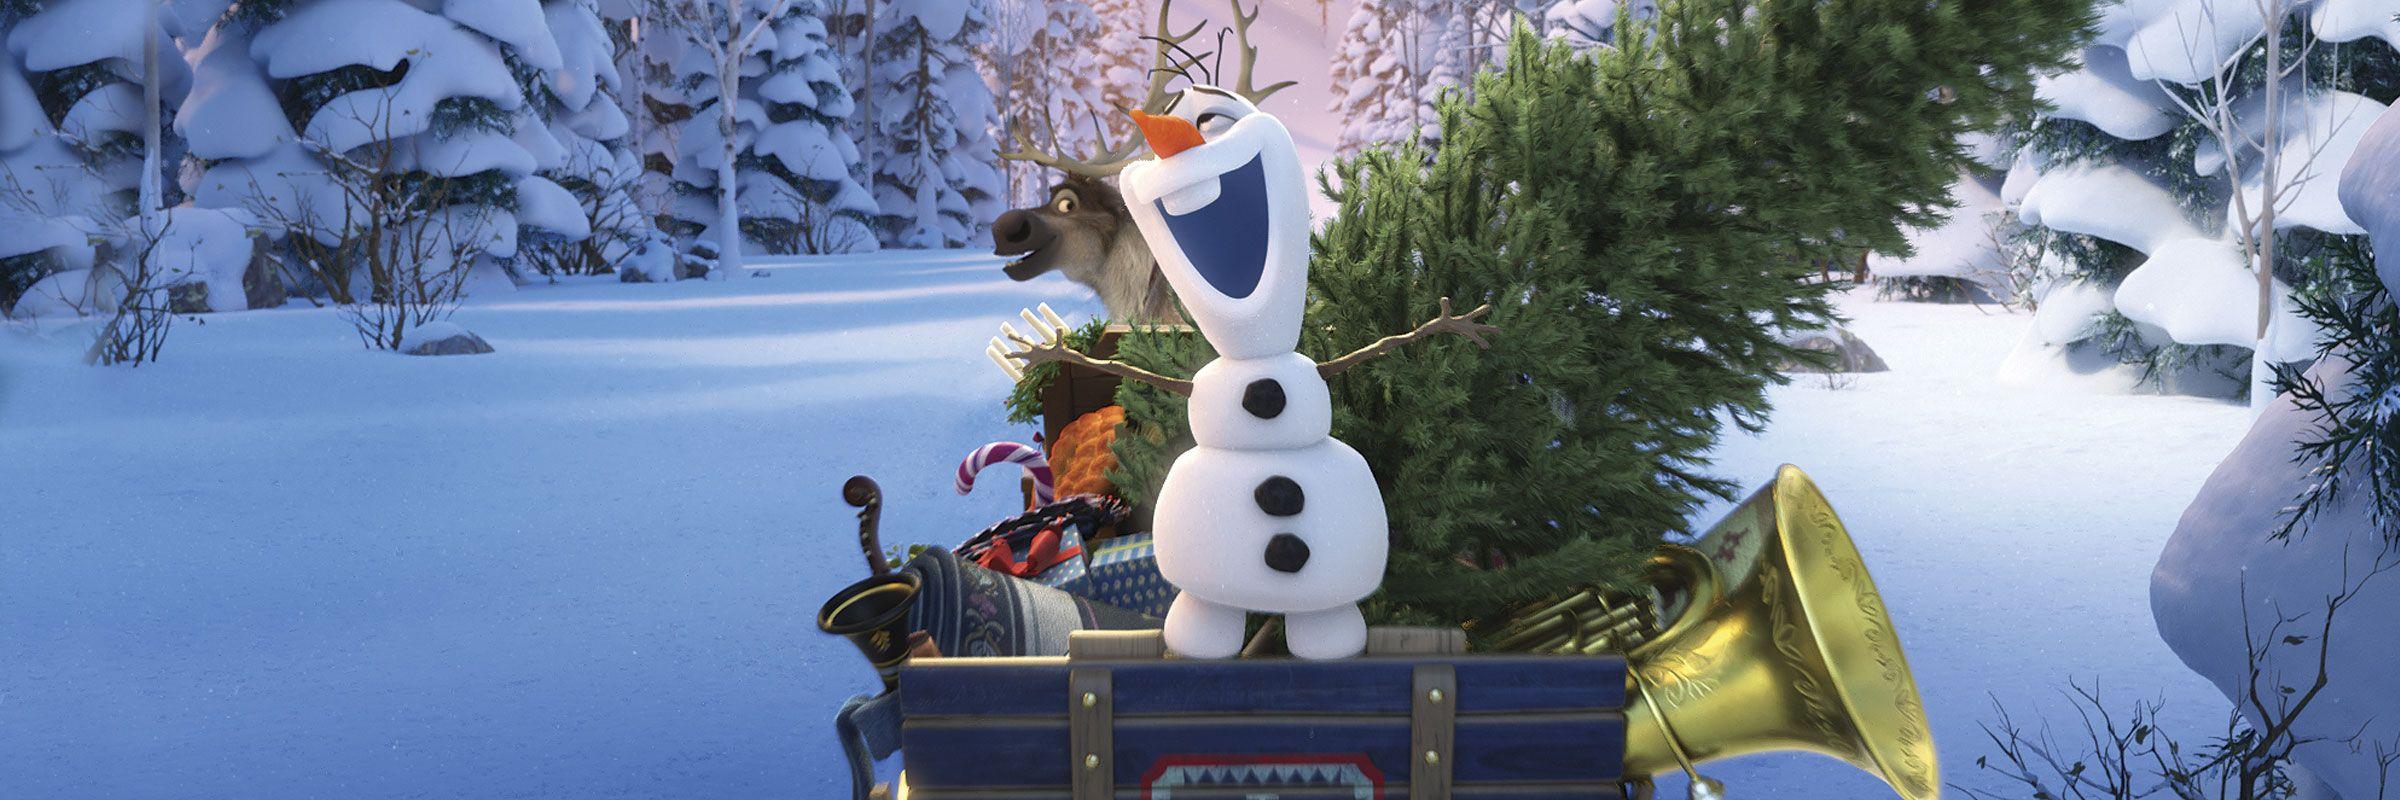 Olaf's Frozen Adventure Plus 6 Disney Tales | Full Movie | Movies